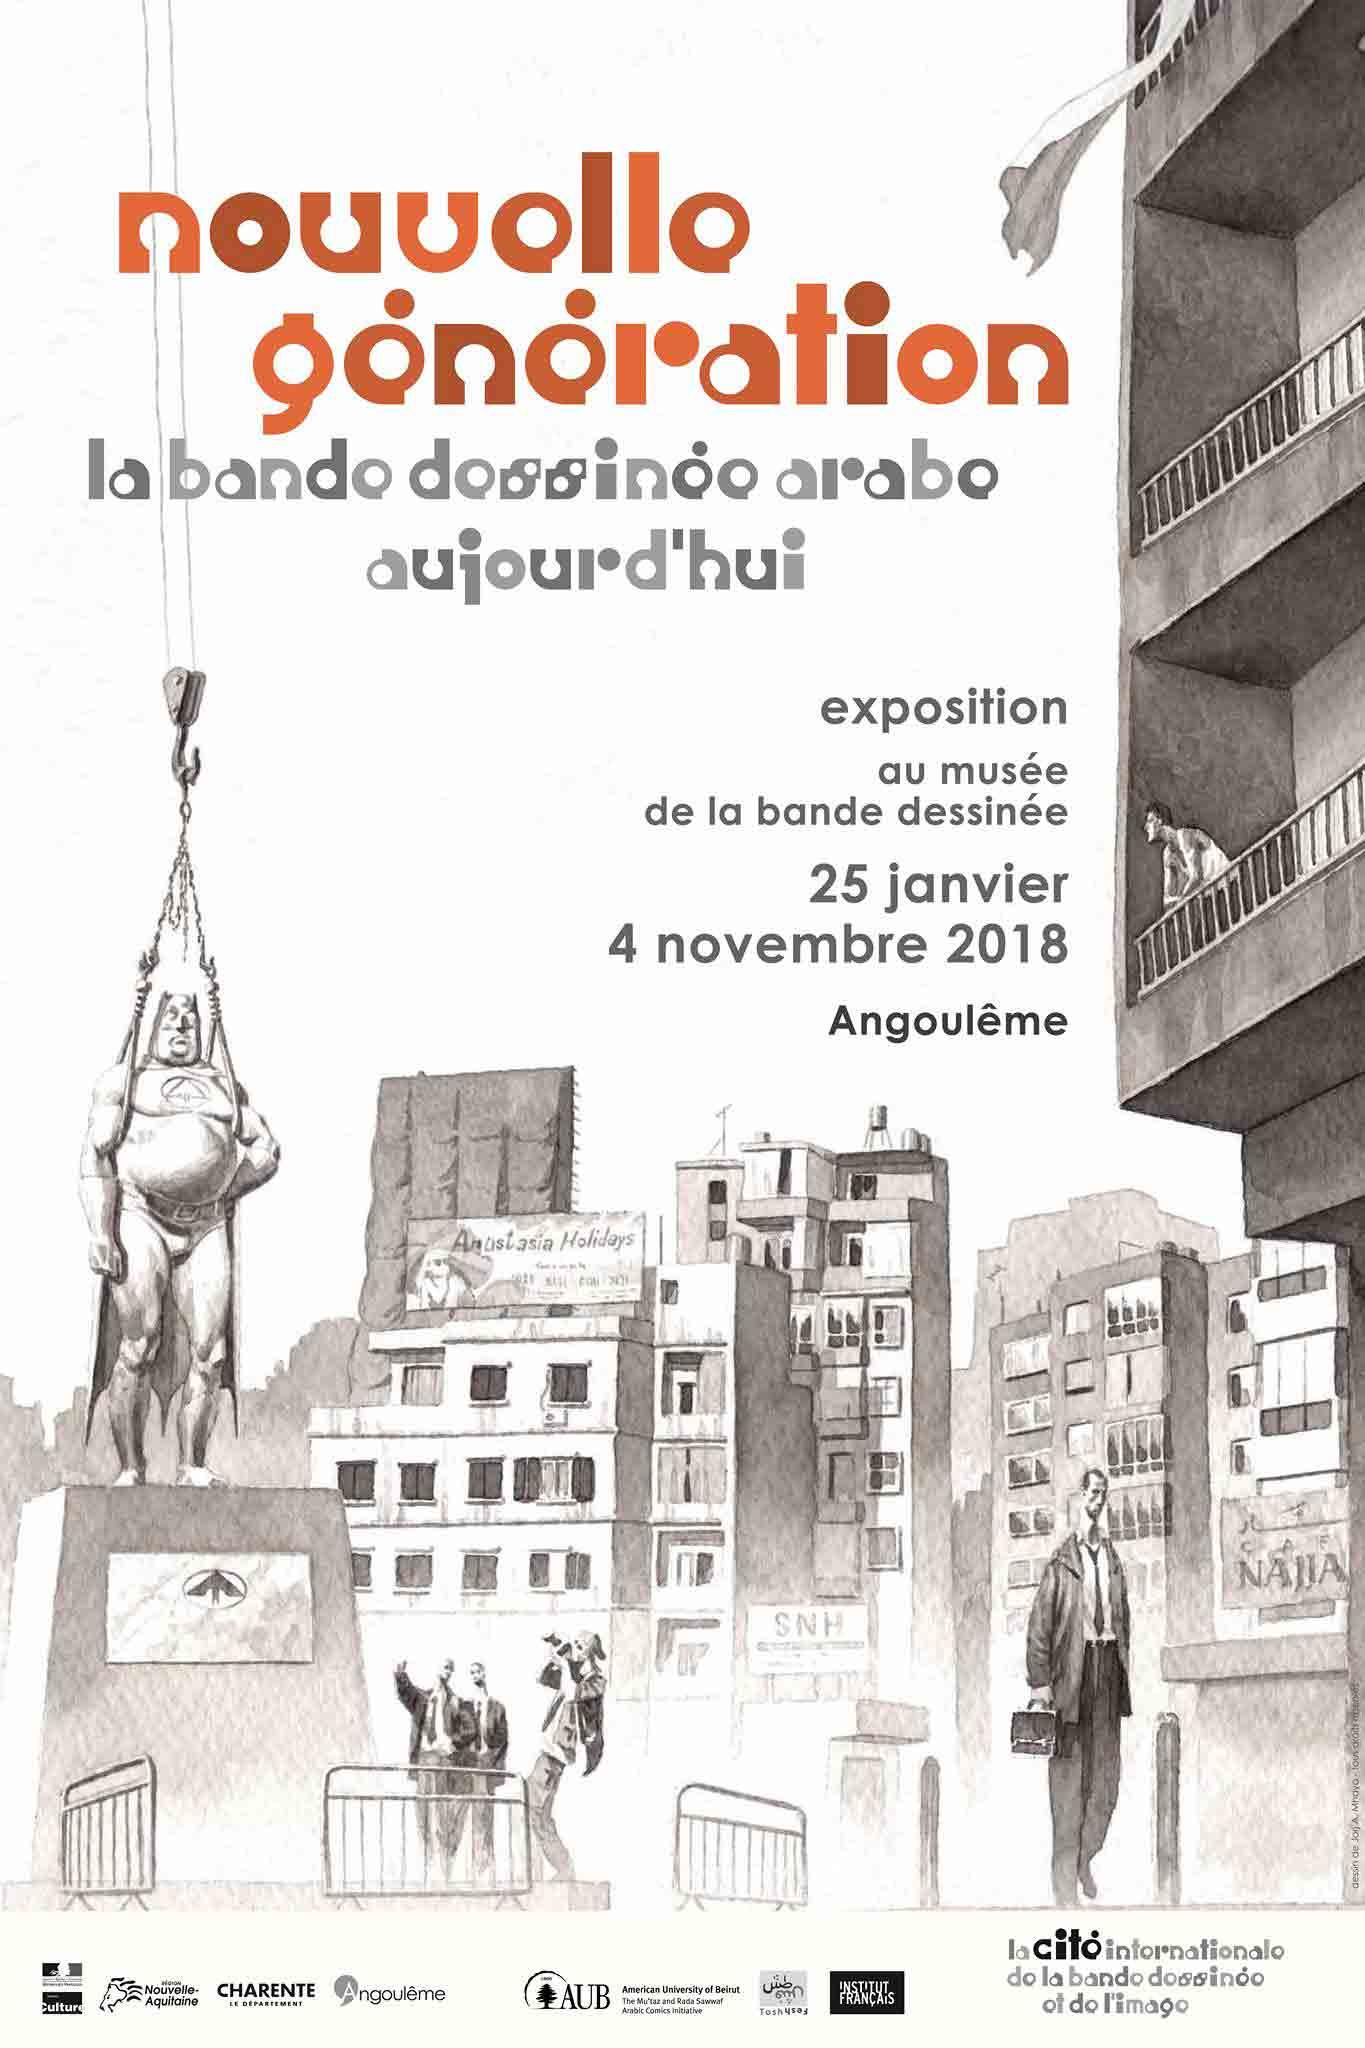 comics-in-Lebanon-5.jpg